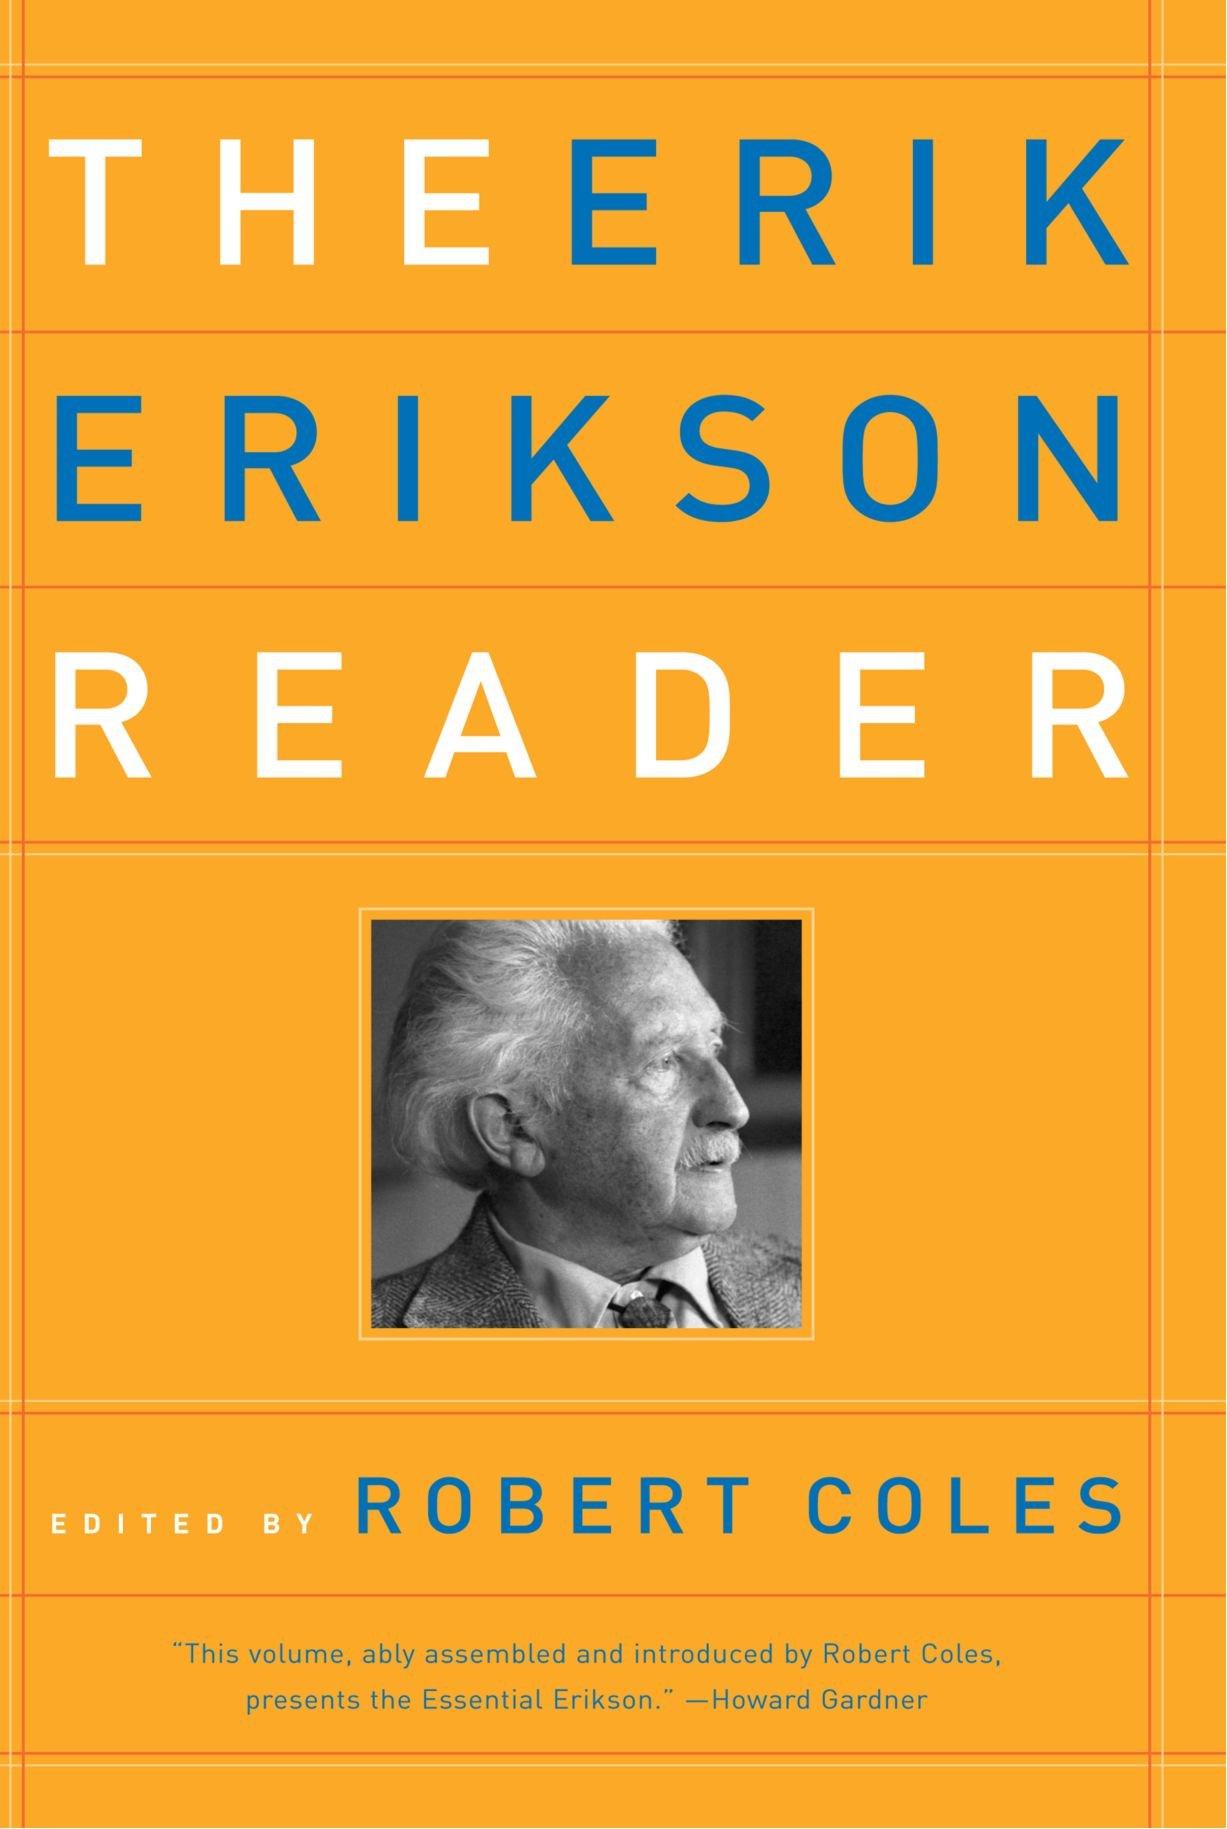 the erik erikson reader erik h erikson robert coles m d the erik erikson reader erik h erikson robert coles m d 9780393320916 com books